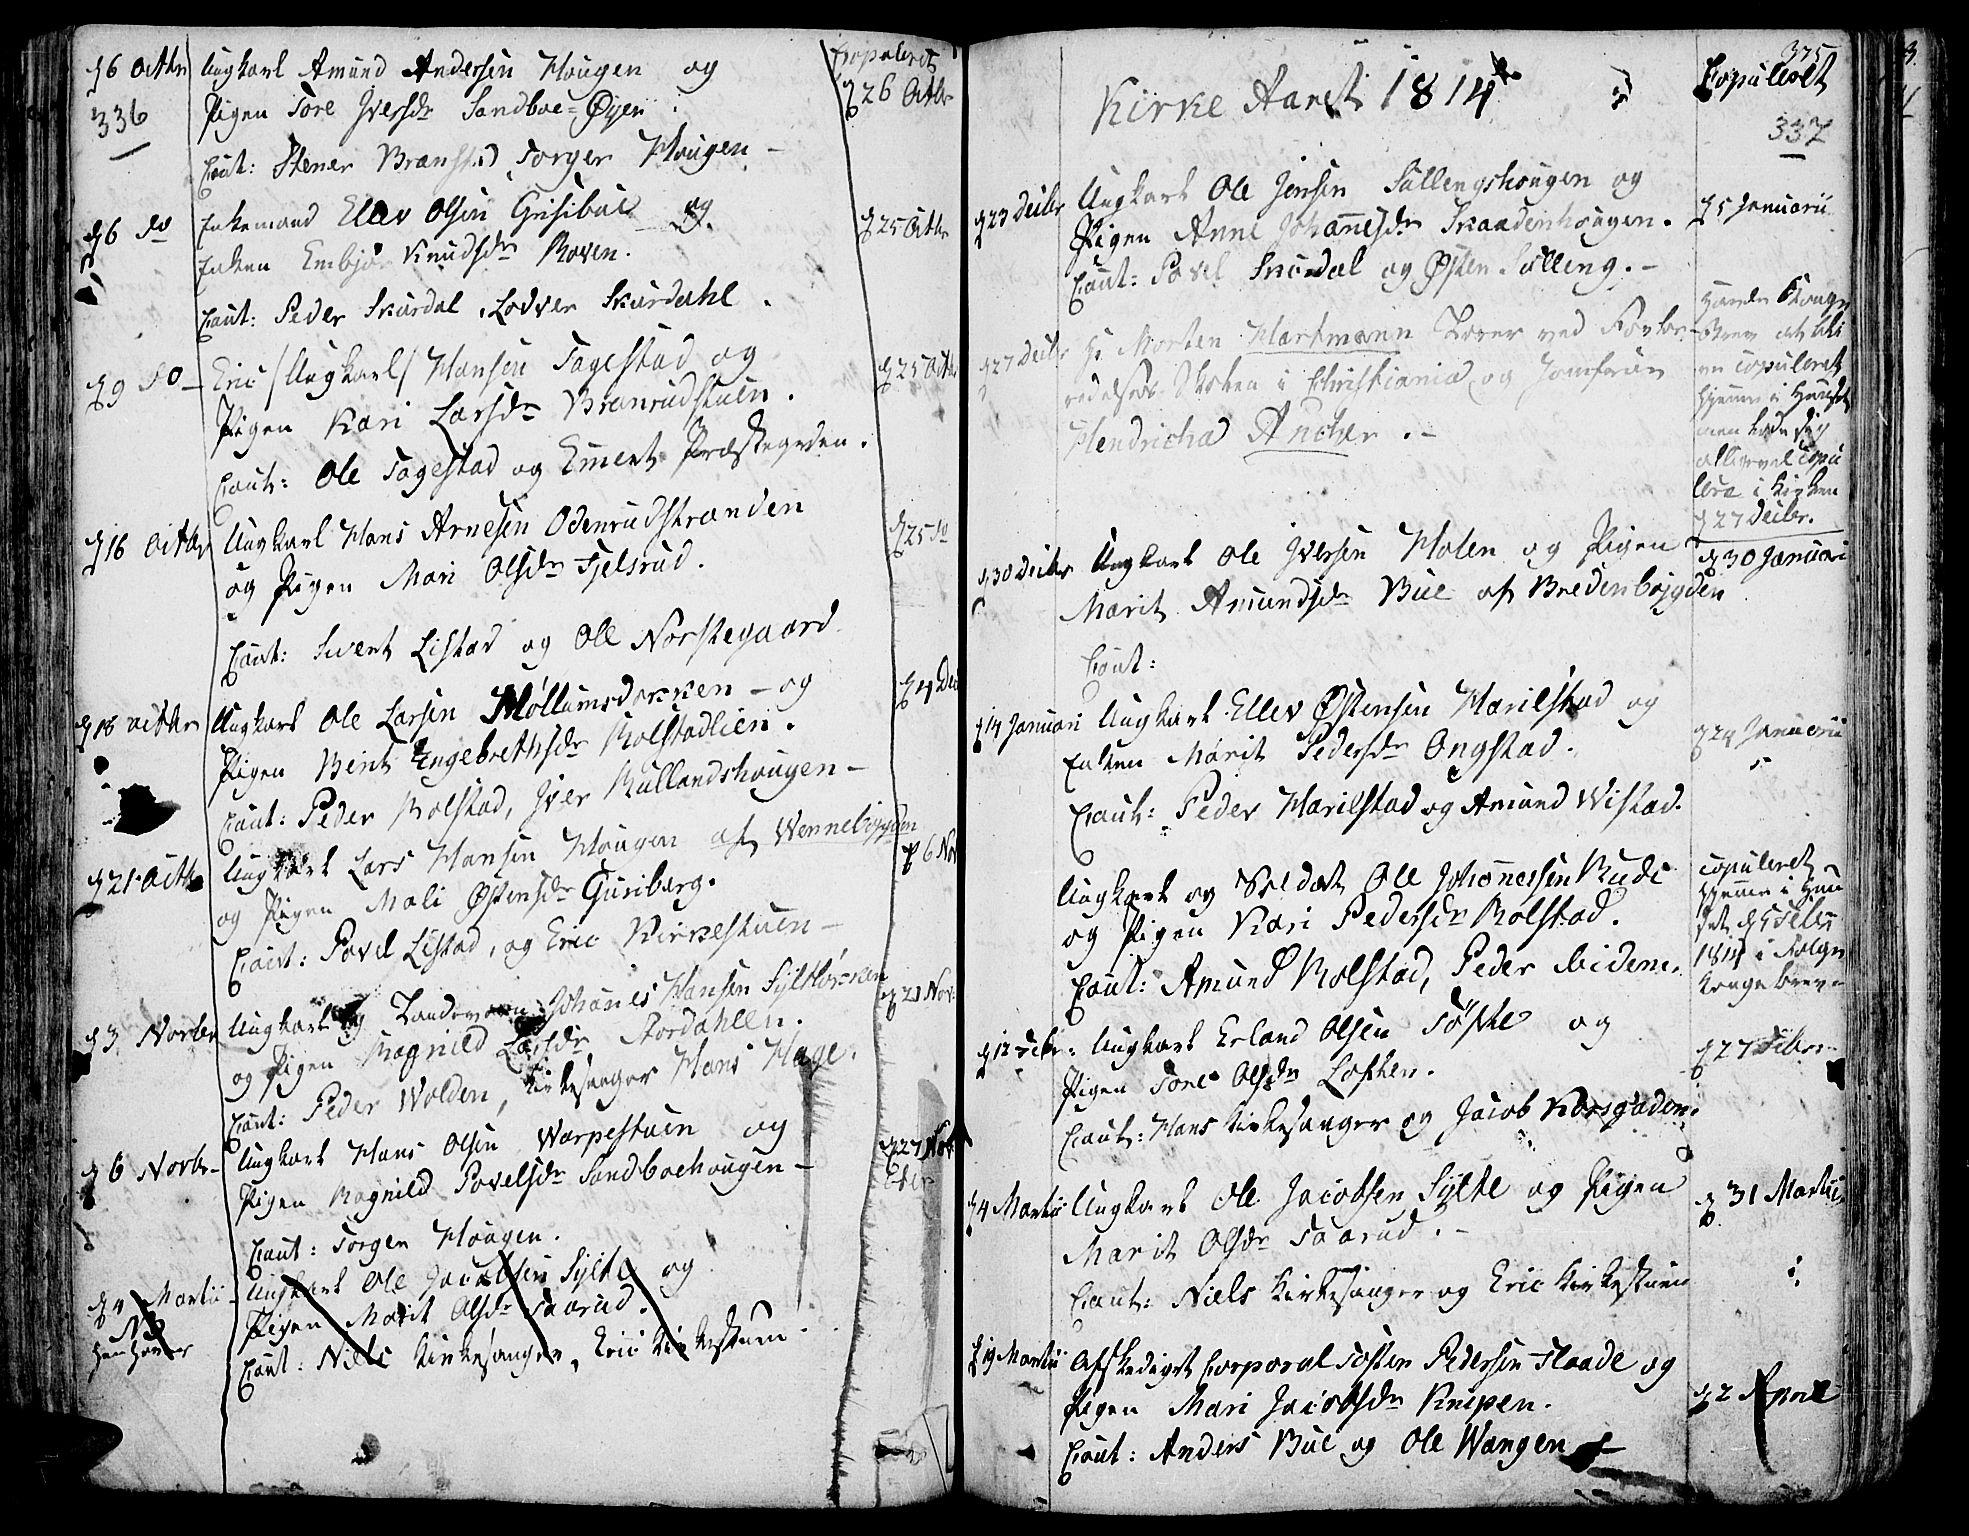 SAH, Fron prestekontor, H/Ha/Haa/L0001: Ministerialbok nr. 1, 1799-1816, s. 336-337